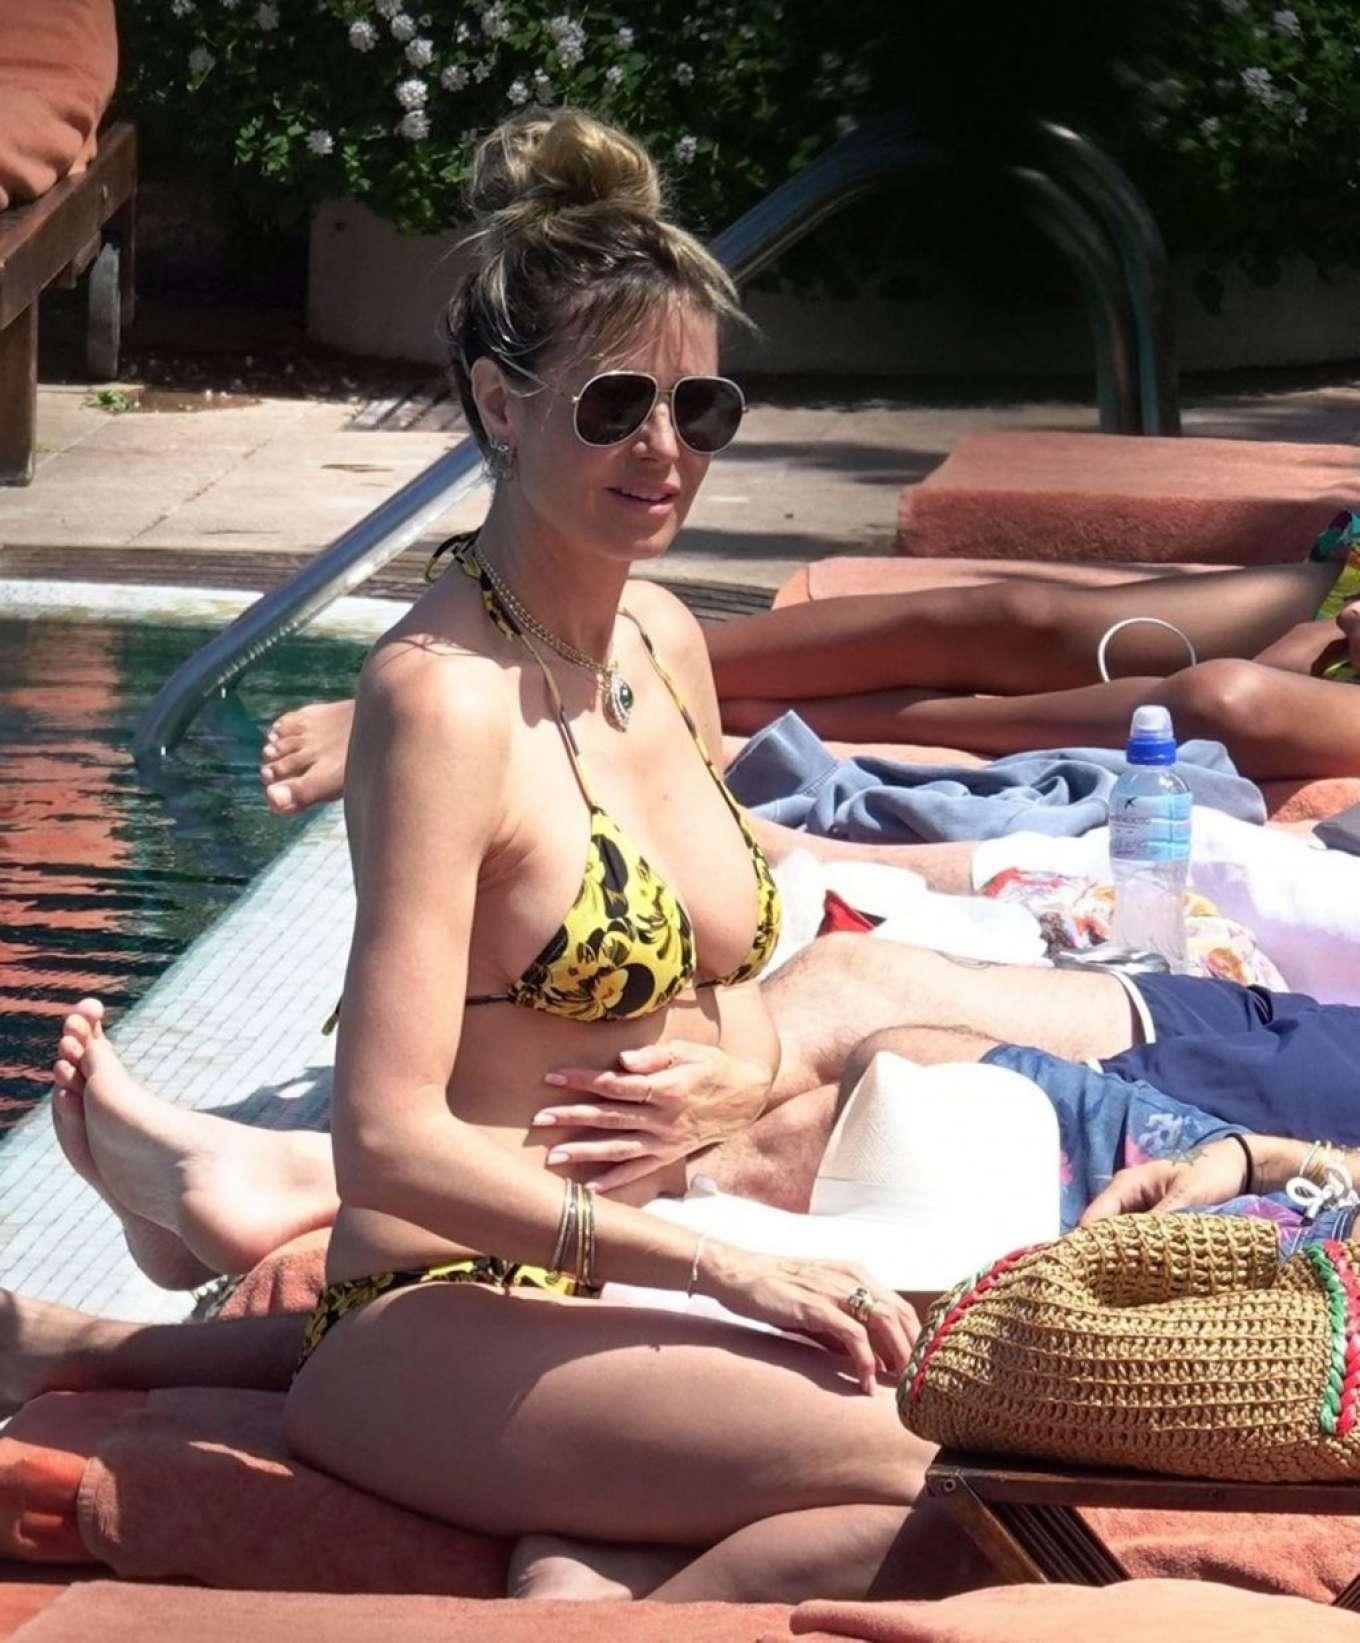 Heidi Klum in Bikini on the pool in Capri